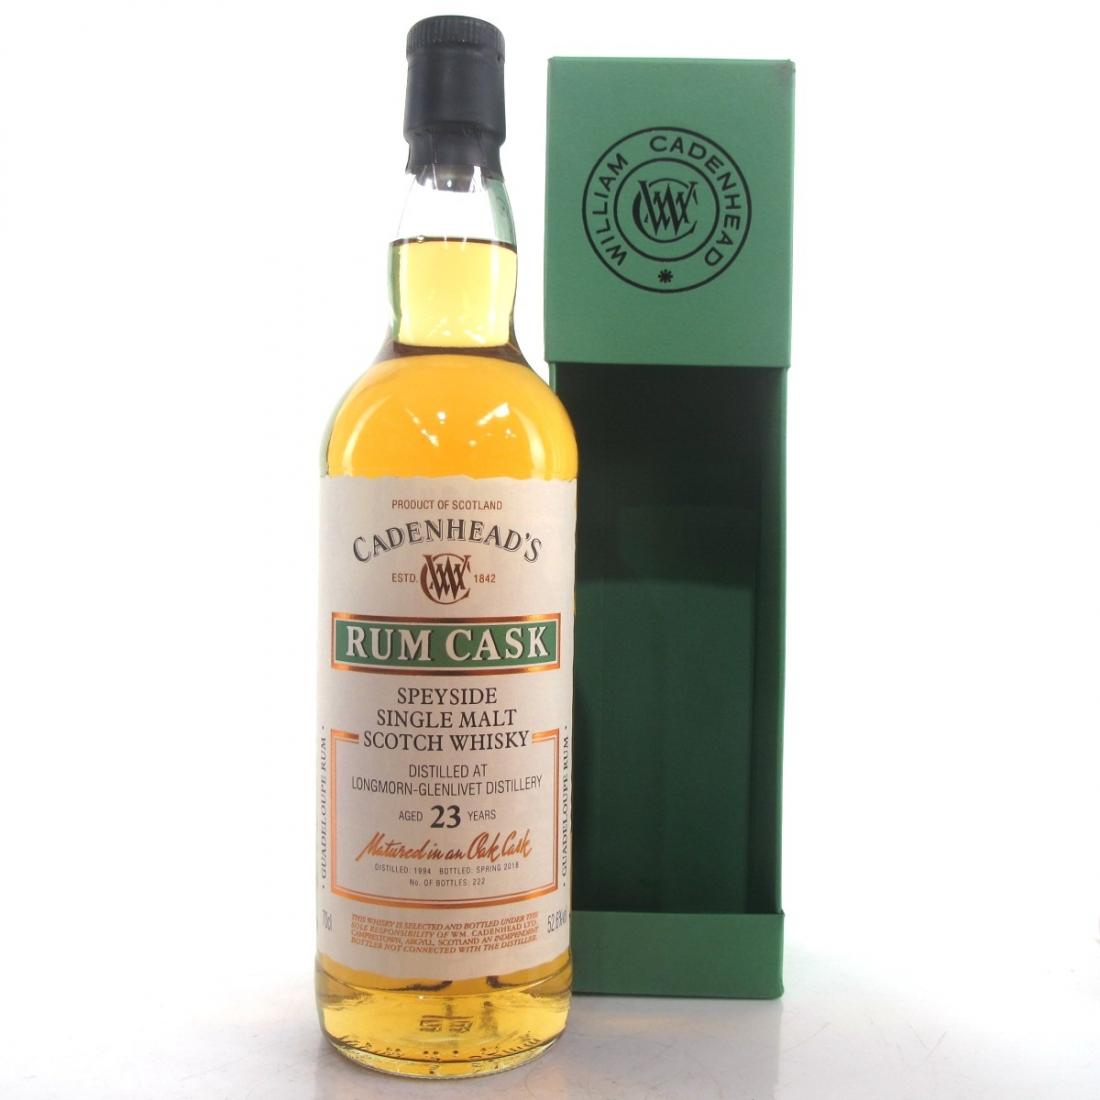 Longmorn 1994 Cadenhead's 23 Year Old Rum Cask